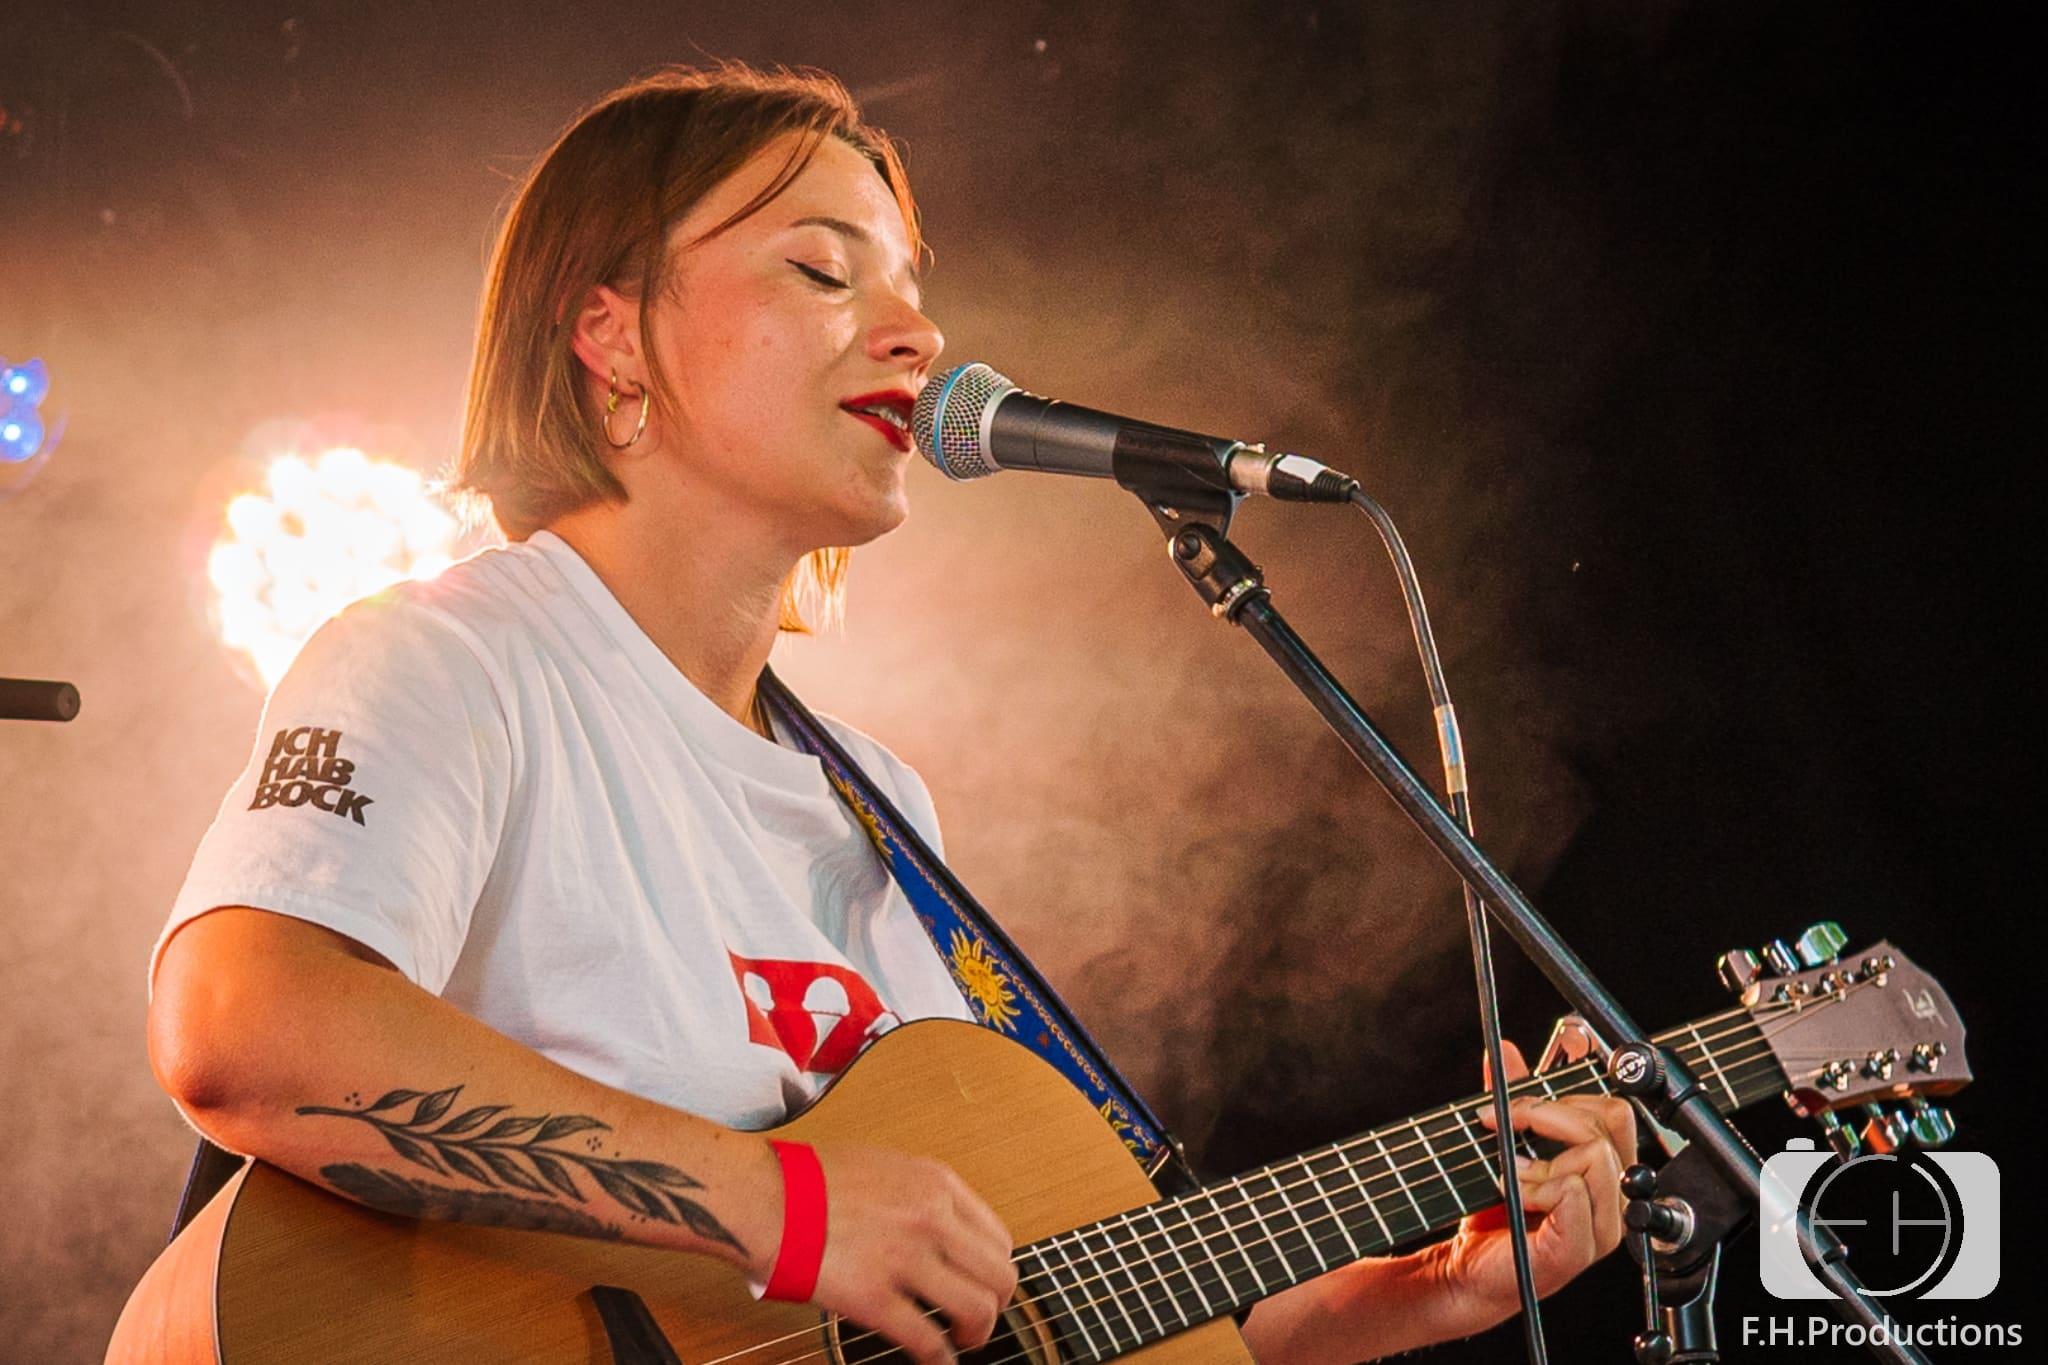 Tamara Roxy